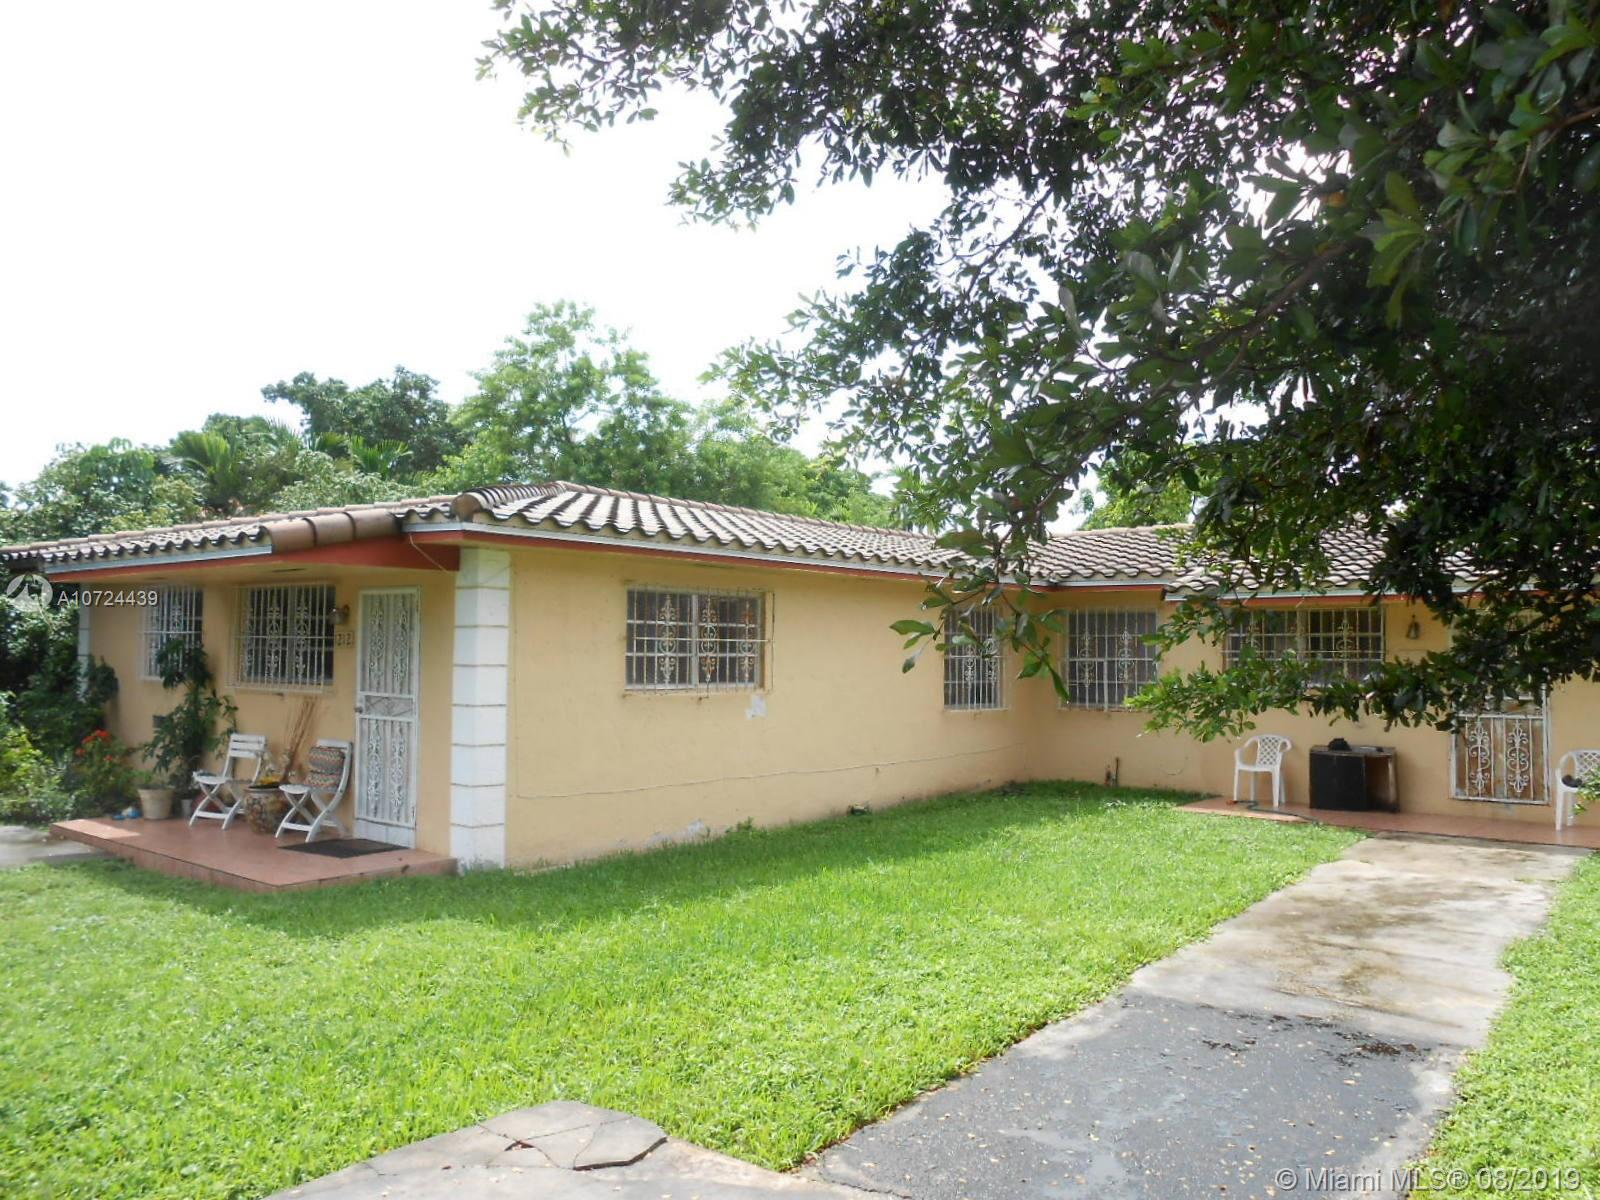 1210-12 NE 121st St, Miami Shores, Florida